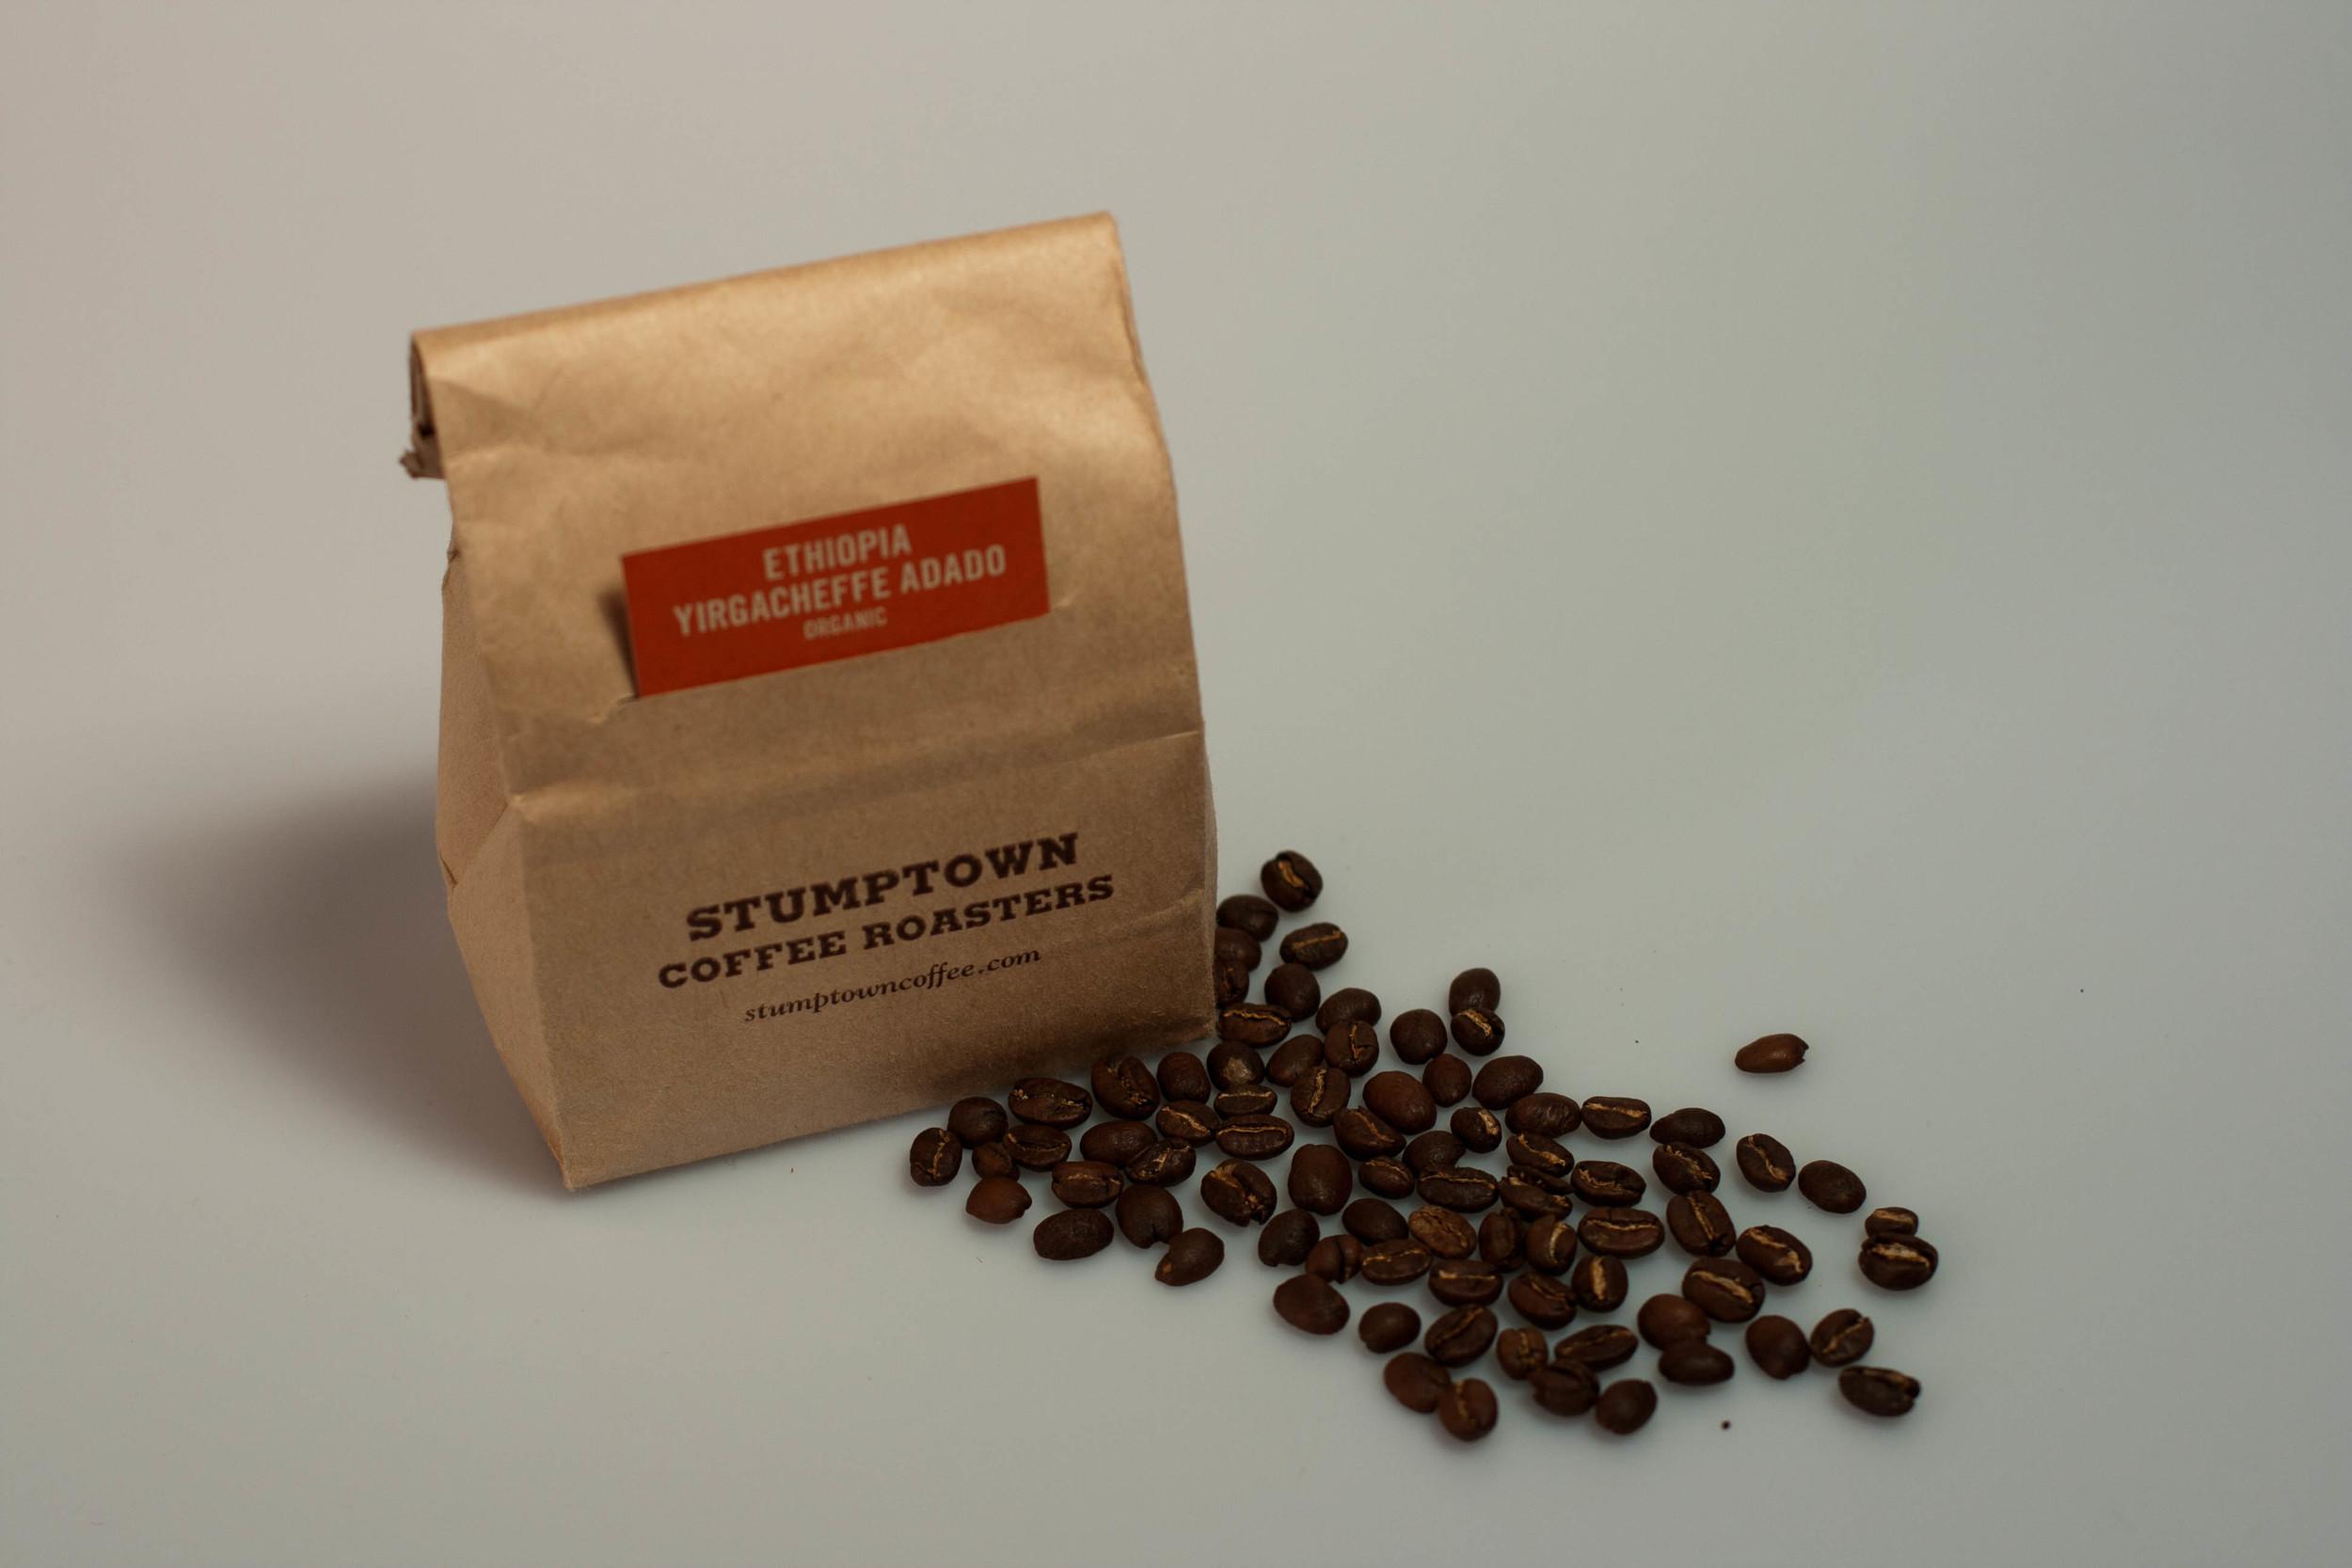 Stumptown Coffee Ethiopia Yirgacheffe Adado Organic